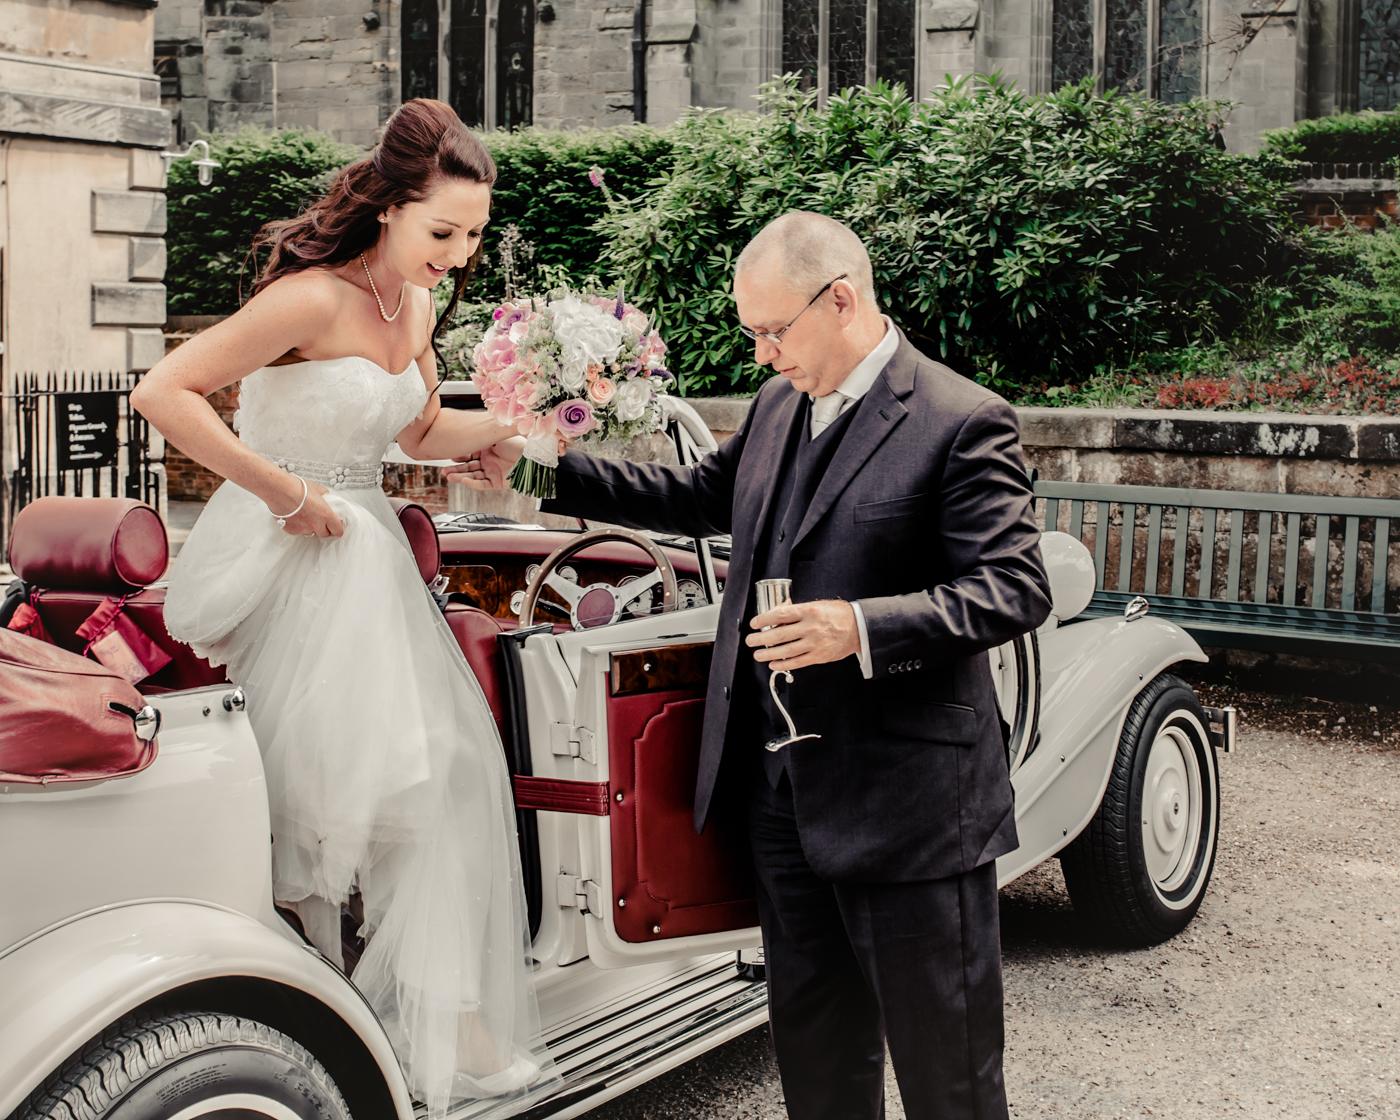 131 - Abi and Chris at Kedleston Hall - Wedding Photography by Mark Pugh www.markpugh.com - 0551.JPG